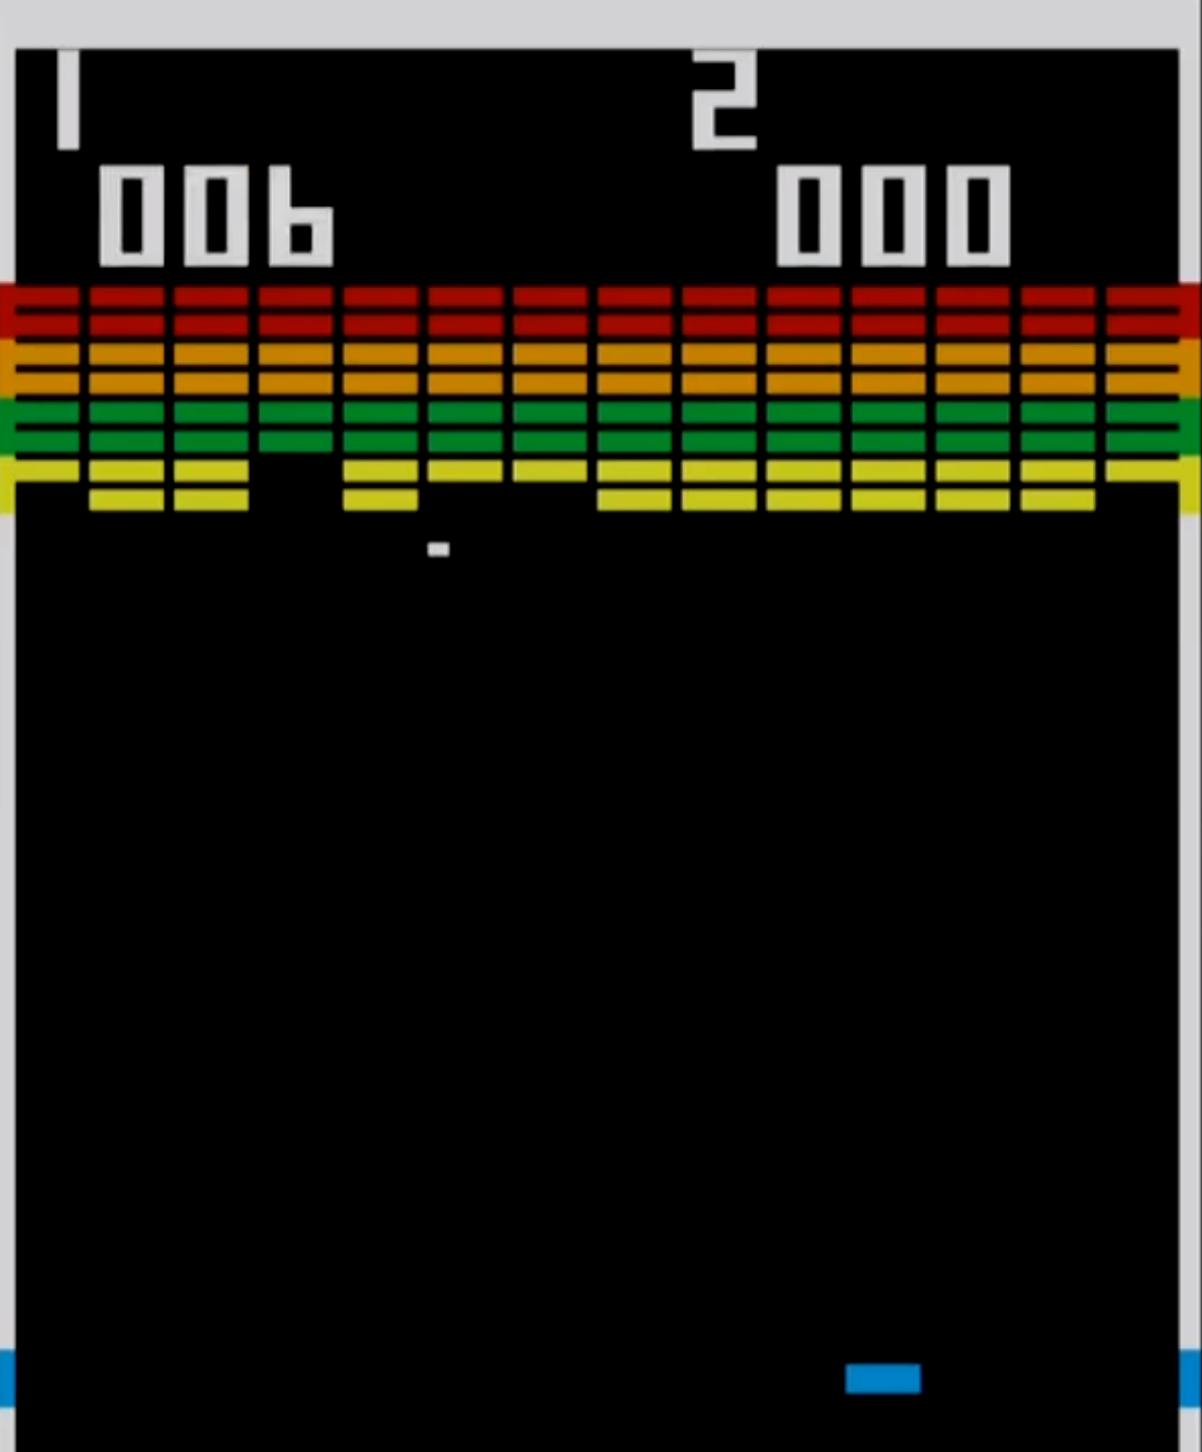 screenshot of the original breakout arcade game.